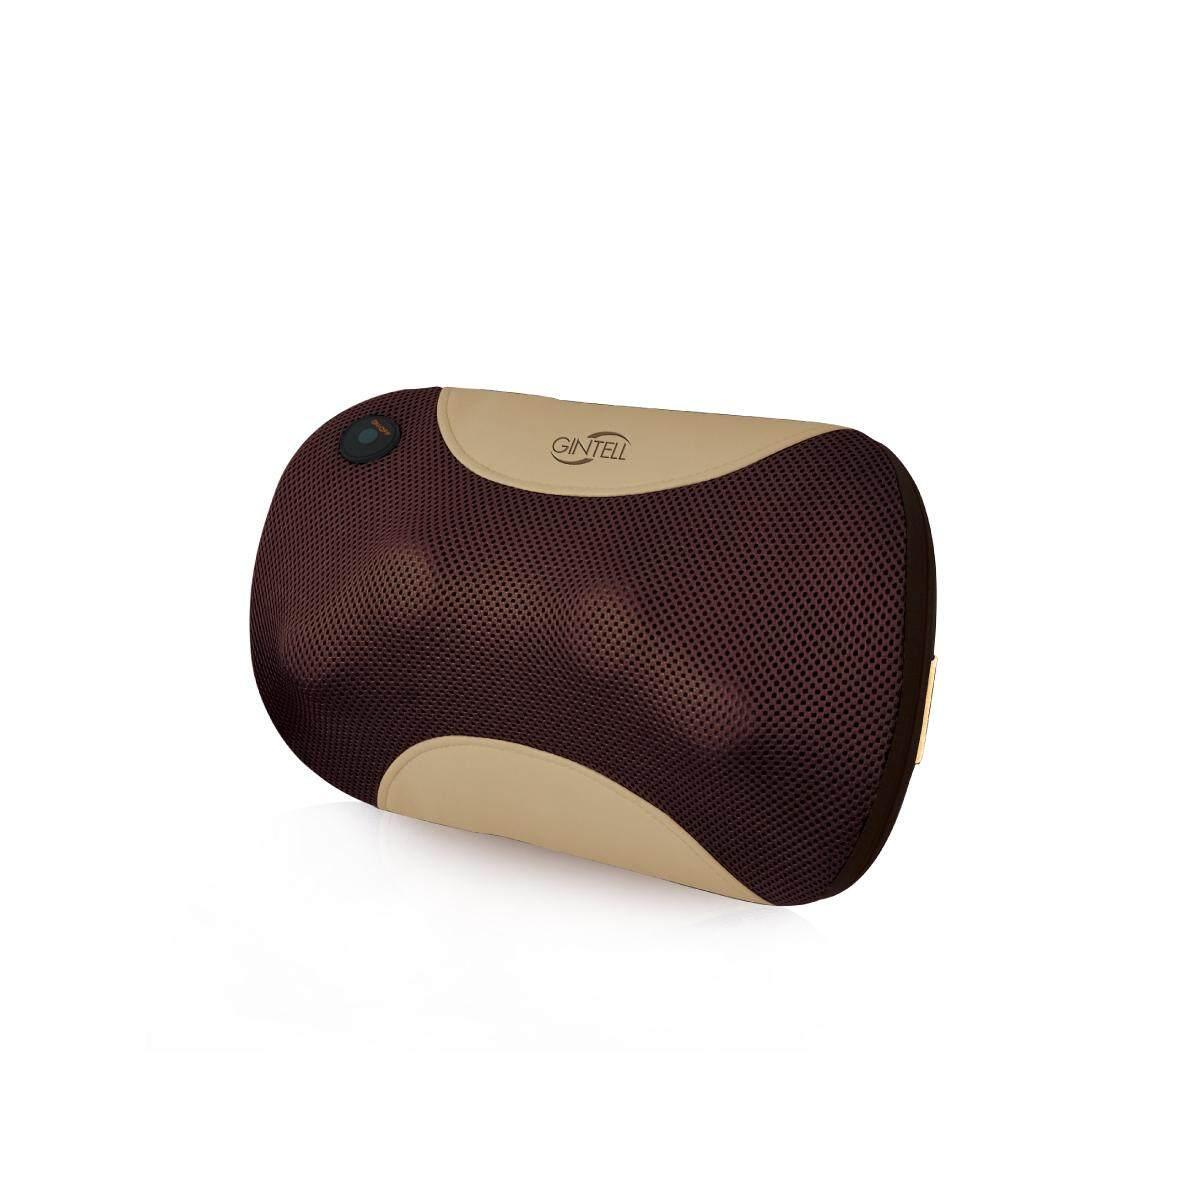 GINTELL G-Minnie EZ Portable Kneading Massager